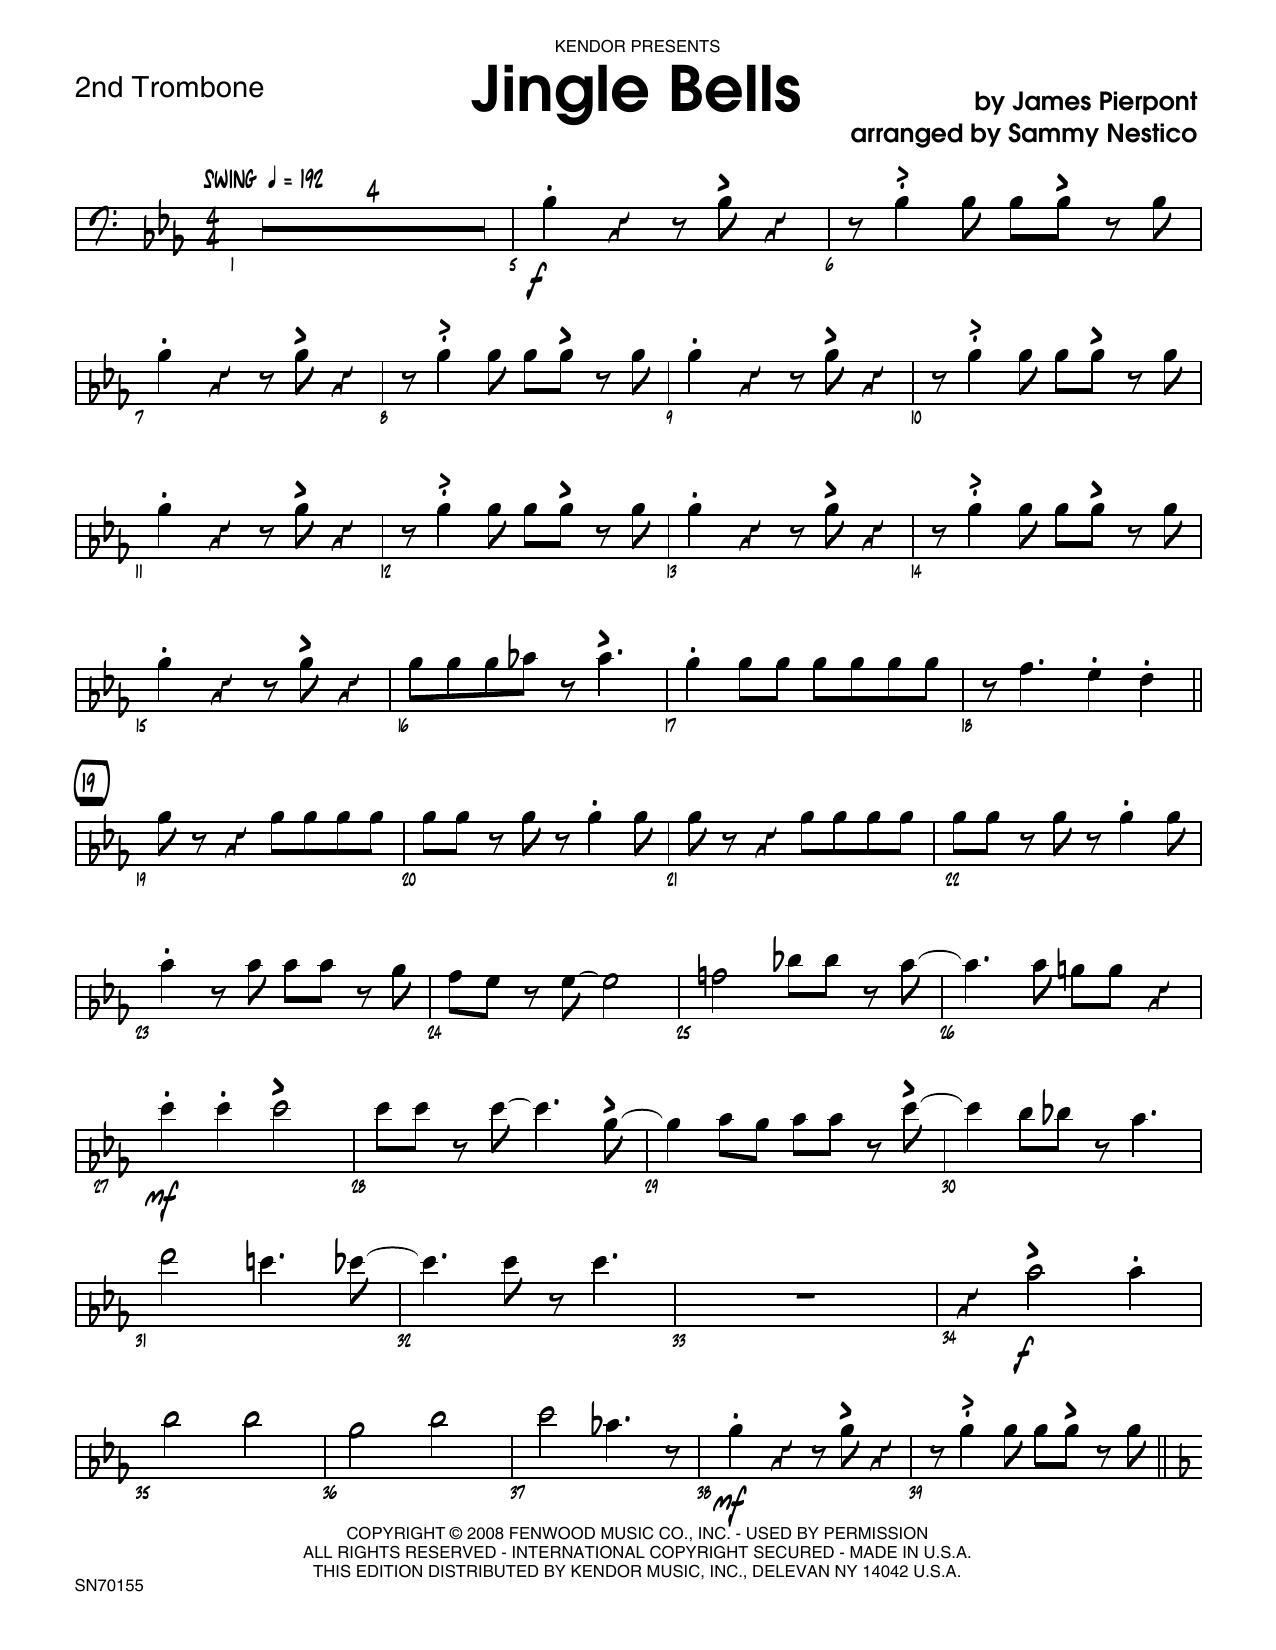 Jingle Bells - 2nd Trombone Sheet Music